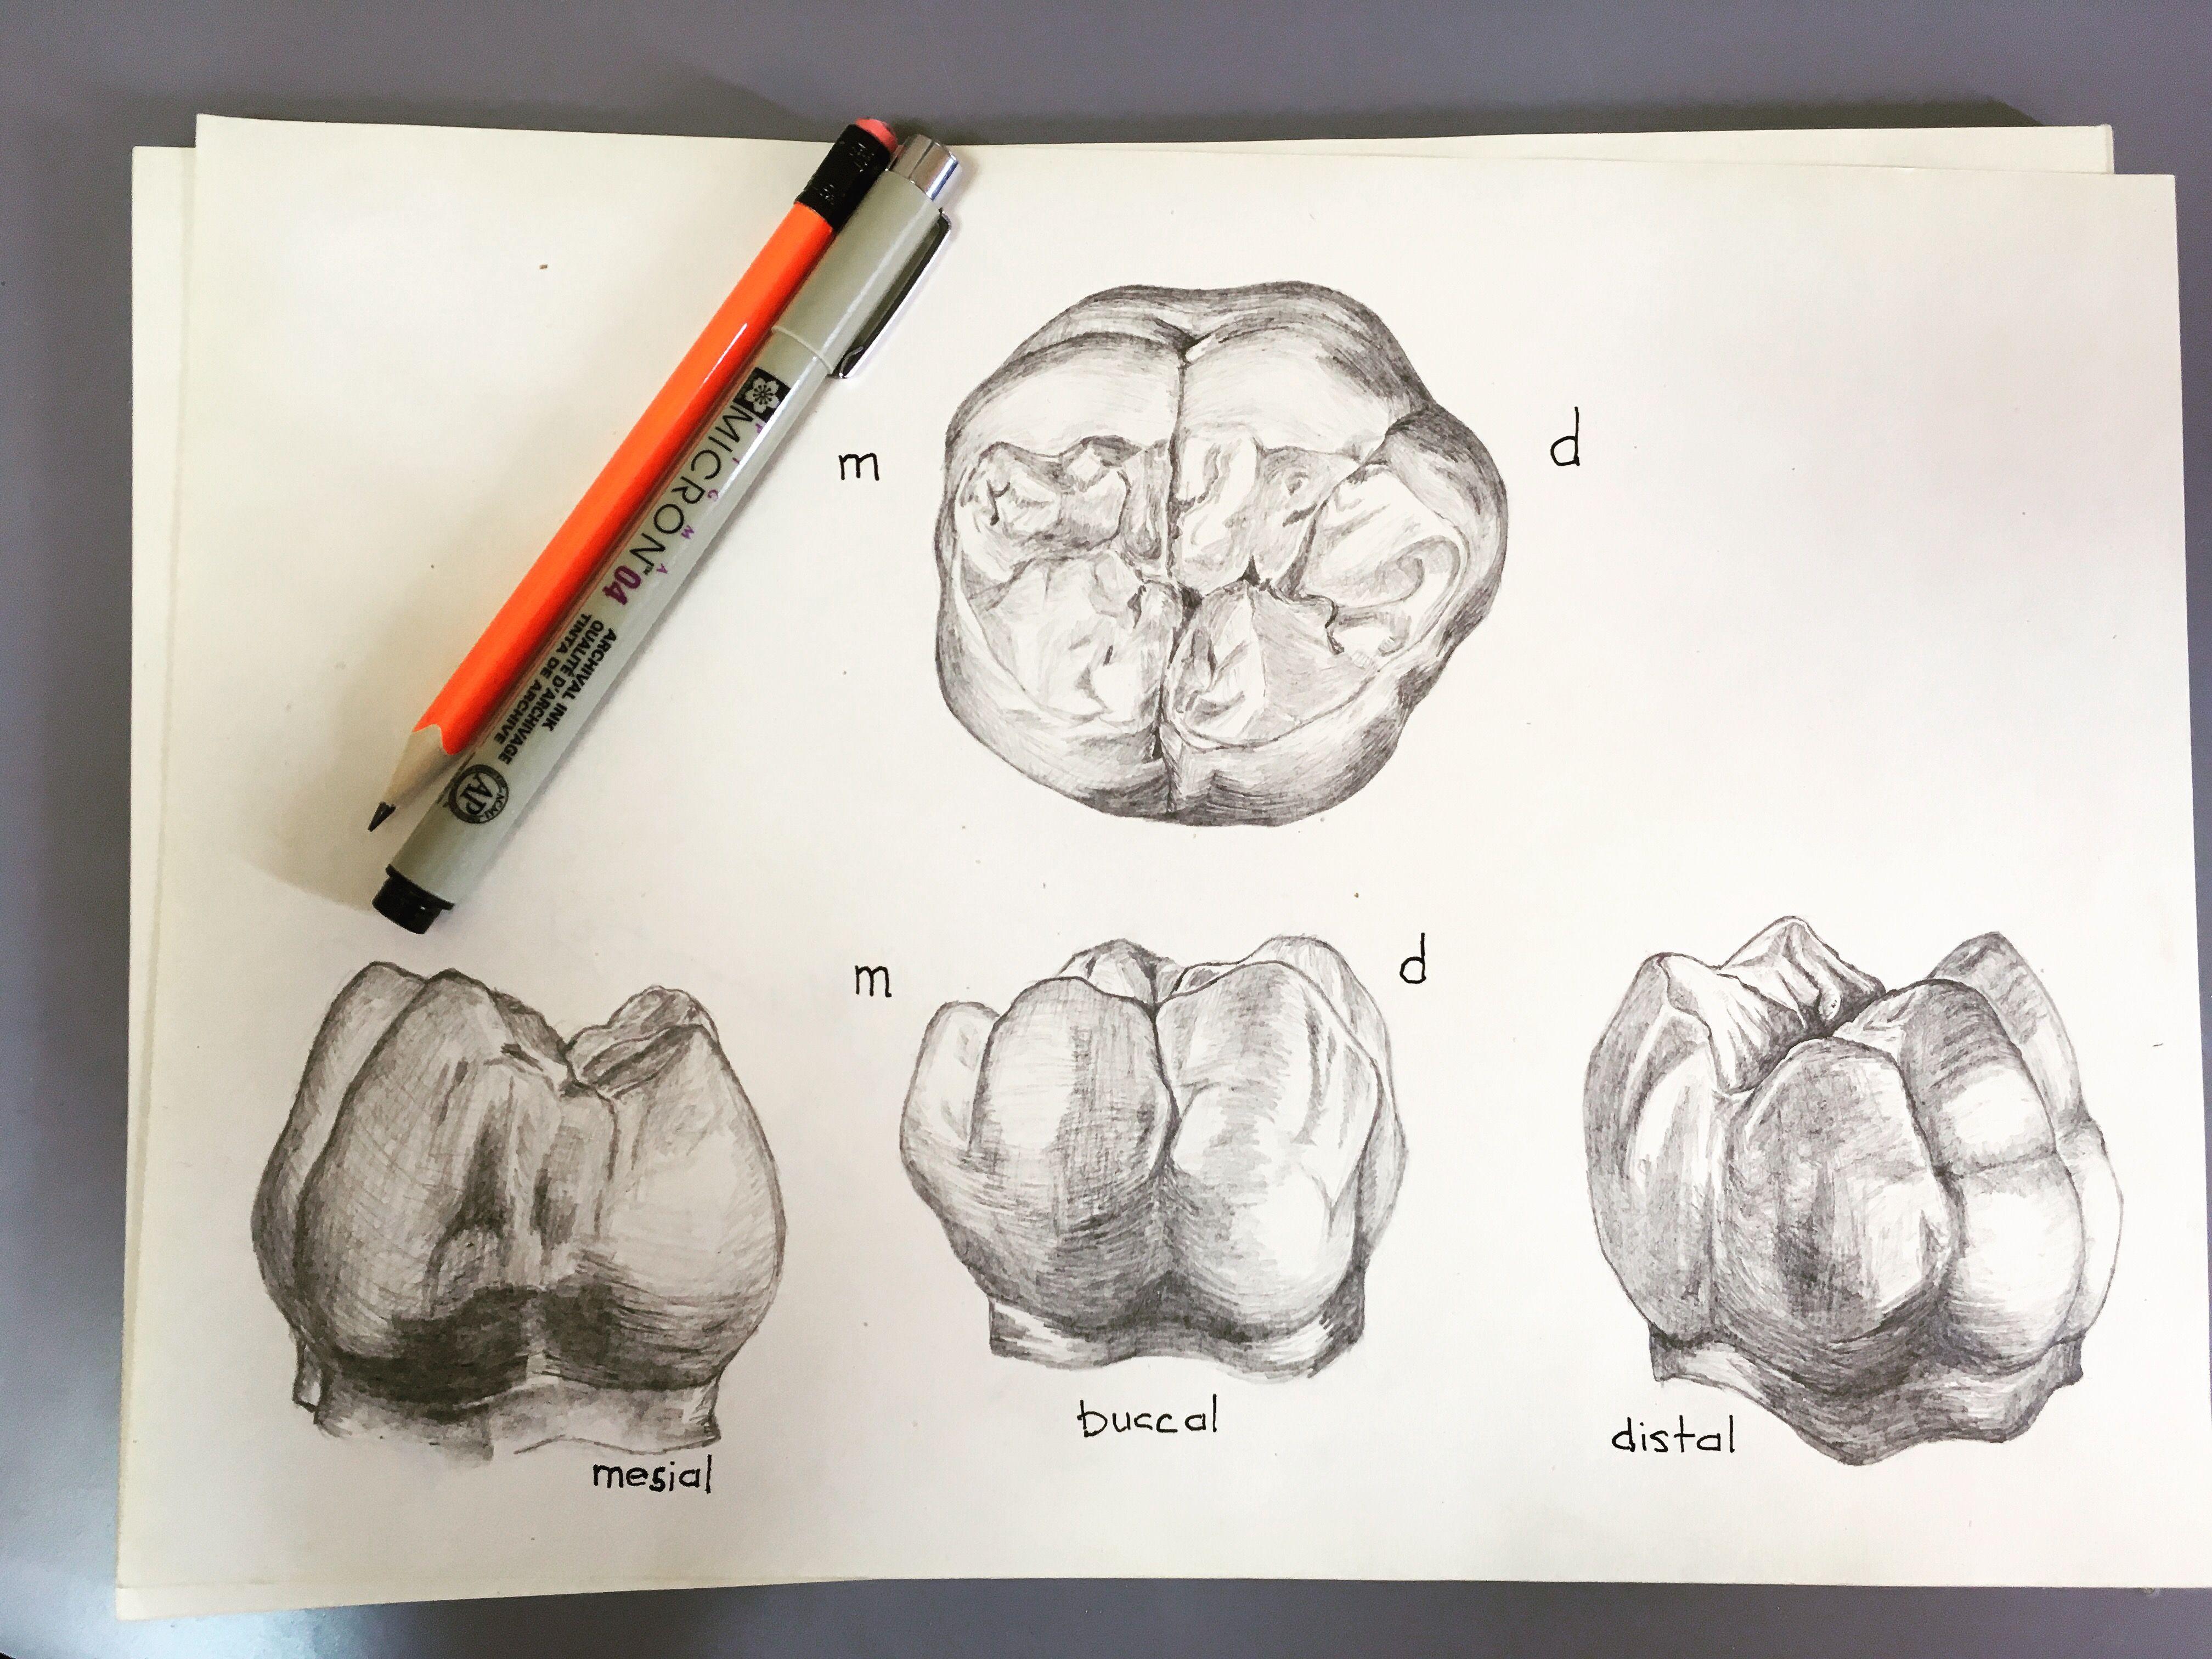 Pin de Piter en Стоматология | Pinterest | Odontología, Dental y Dientes